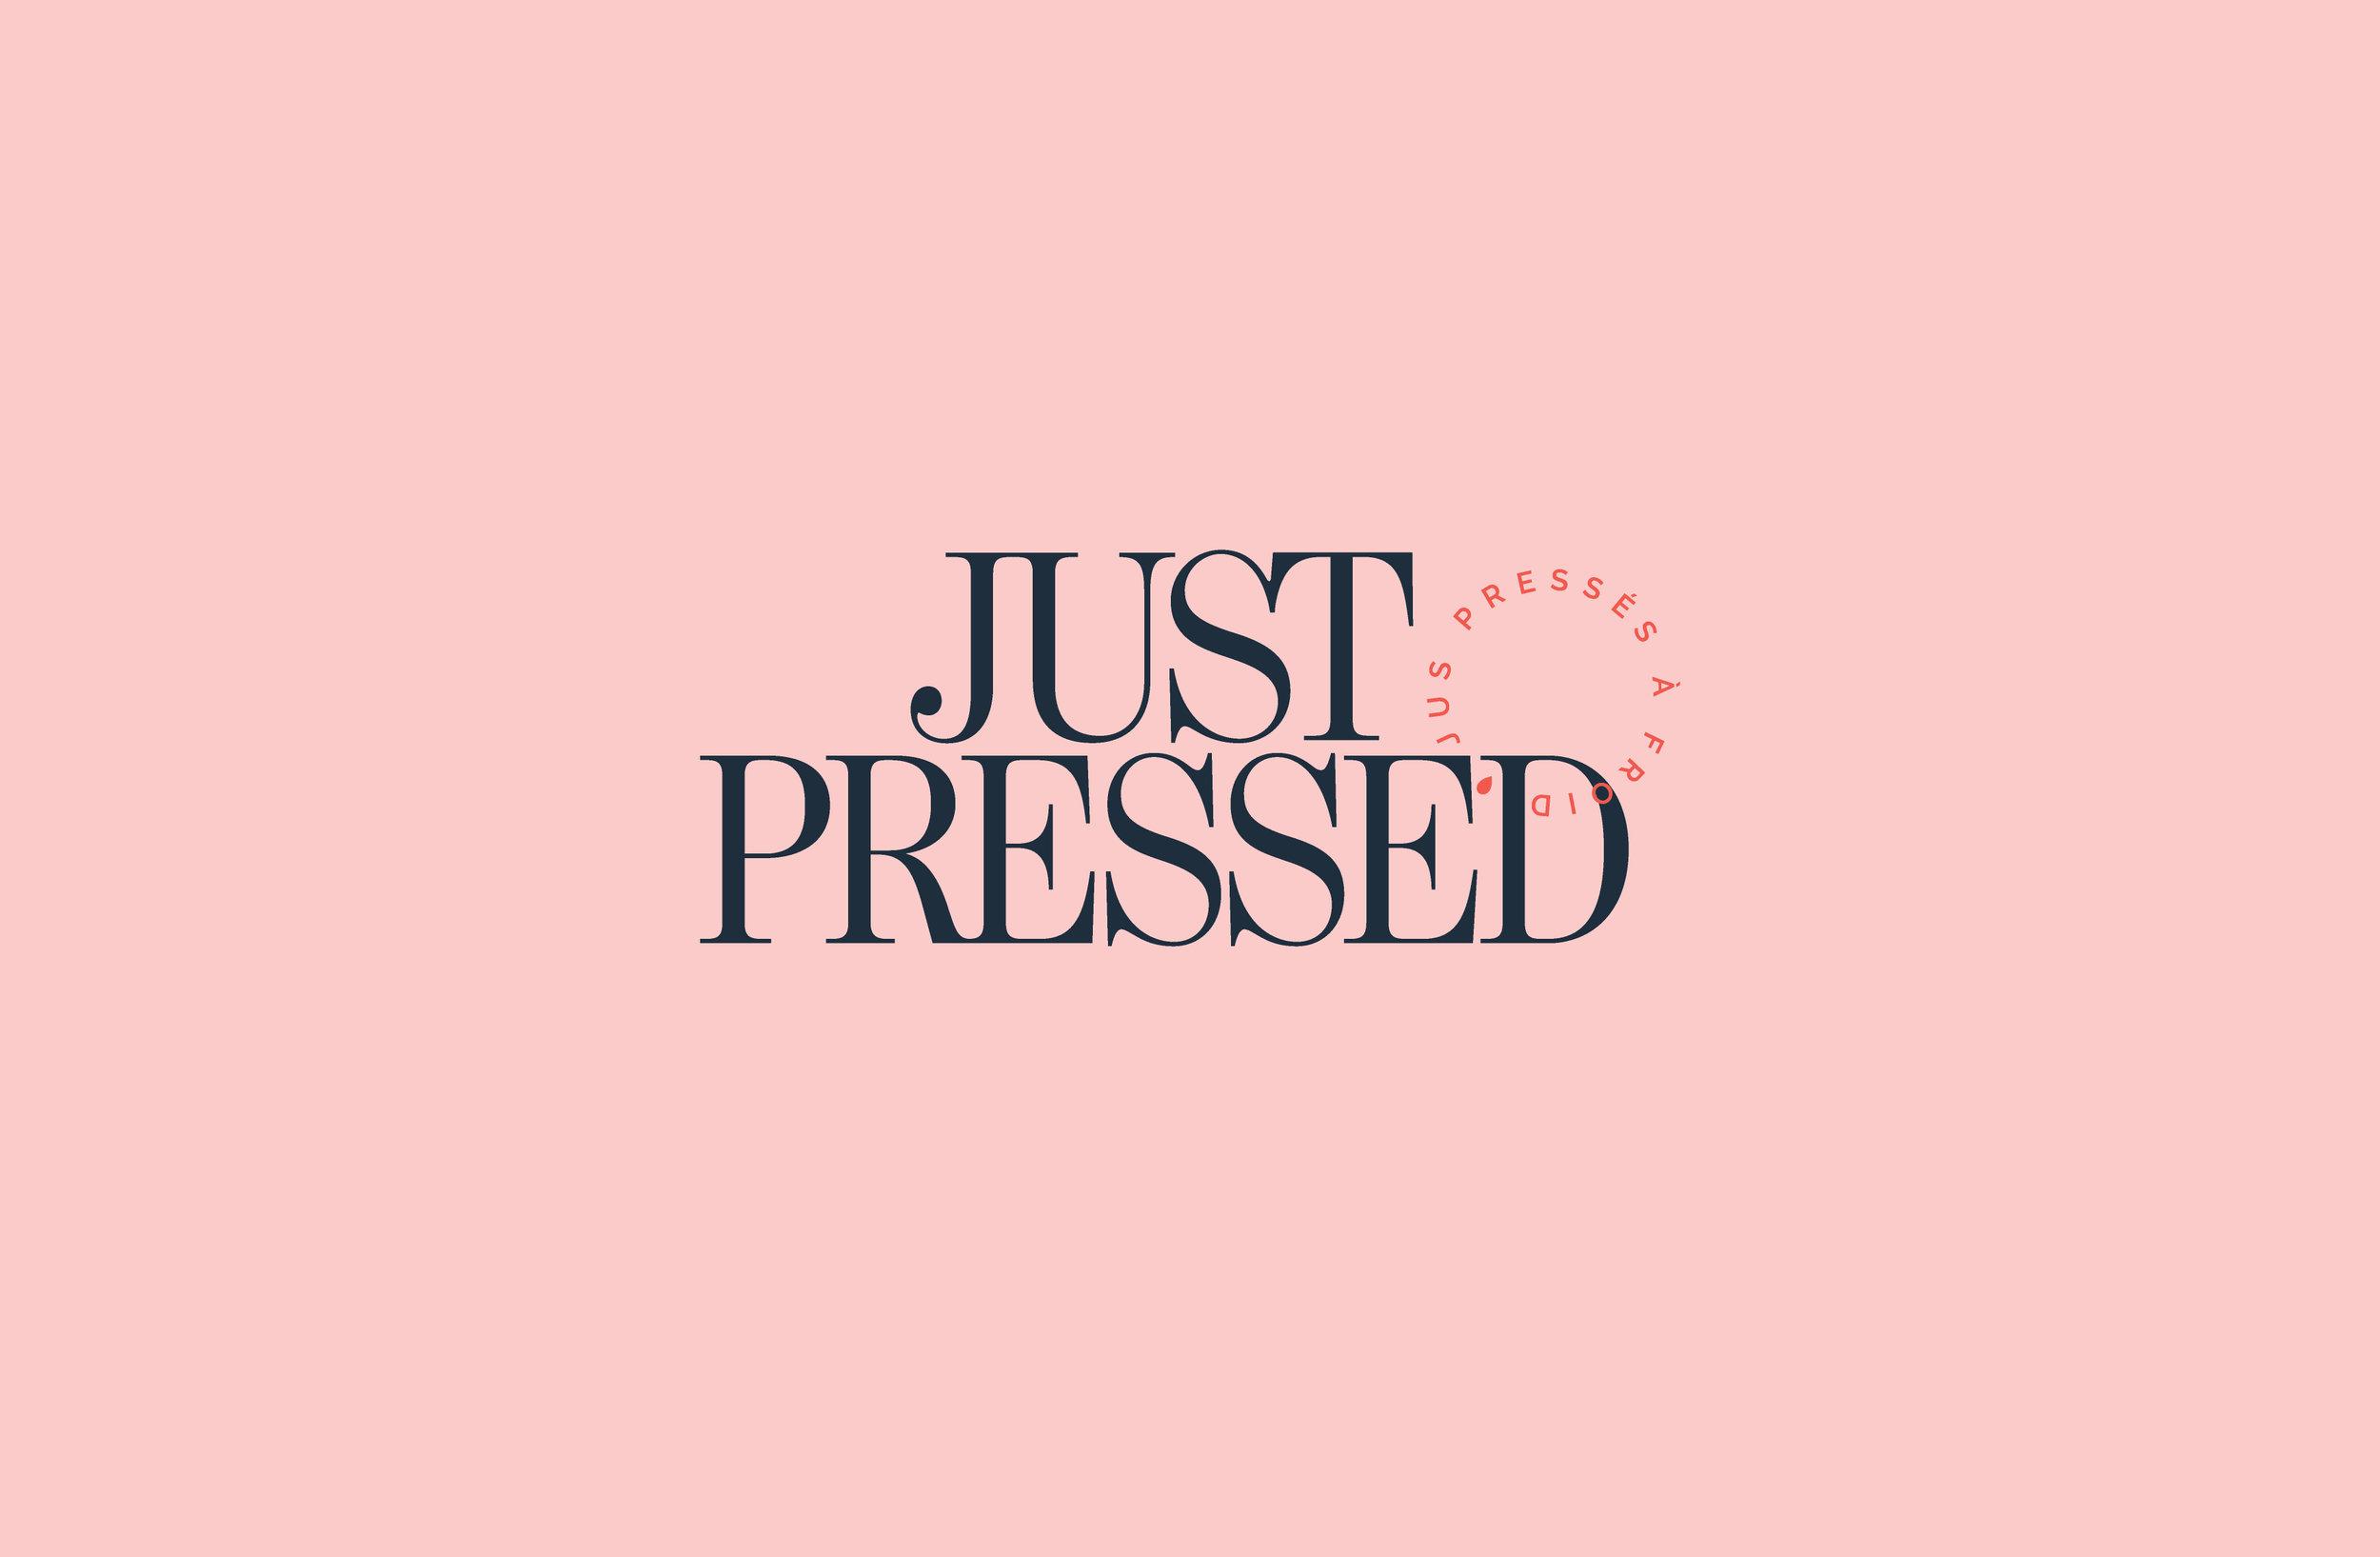 JUST-PRESSED-Behance-7.jpg